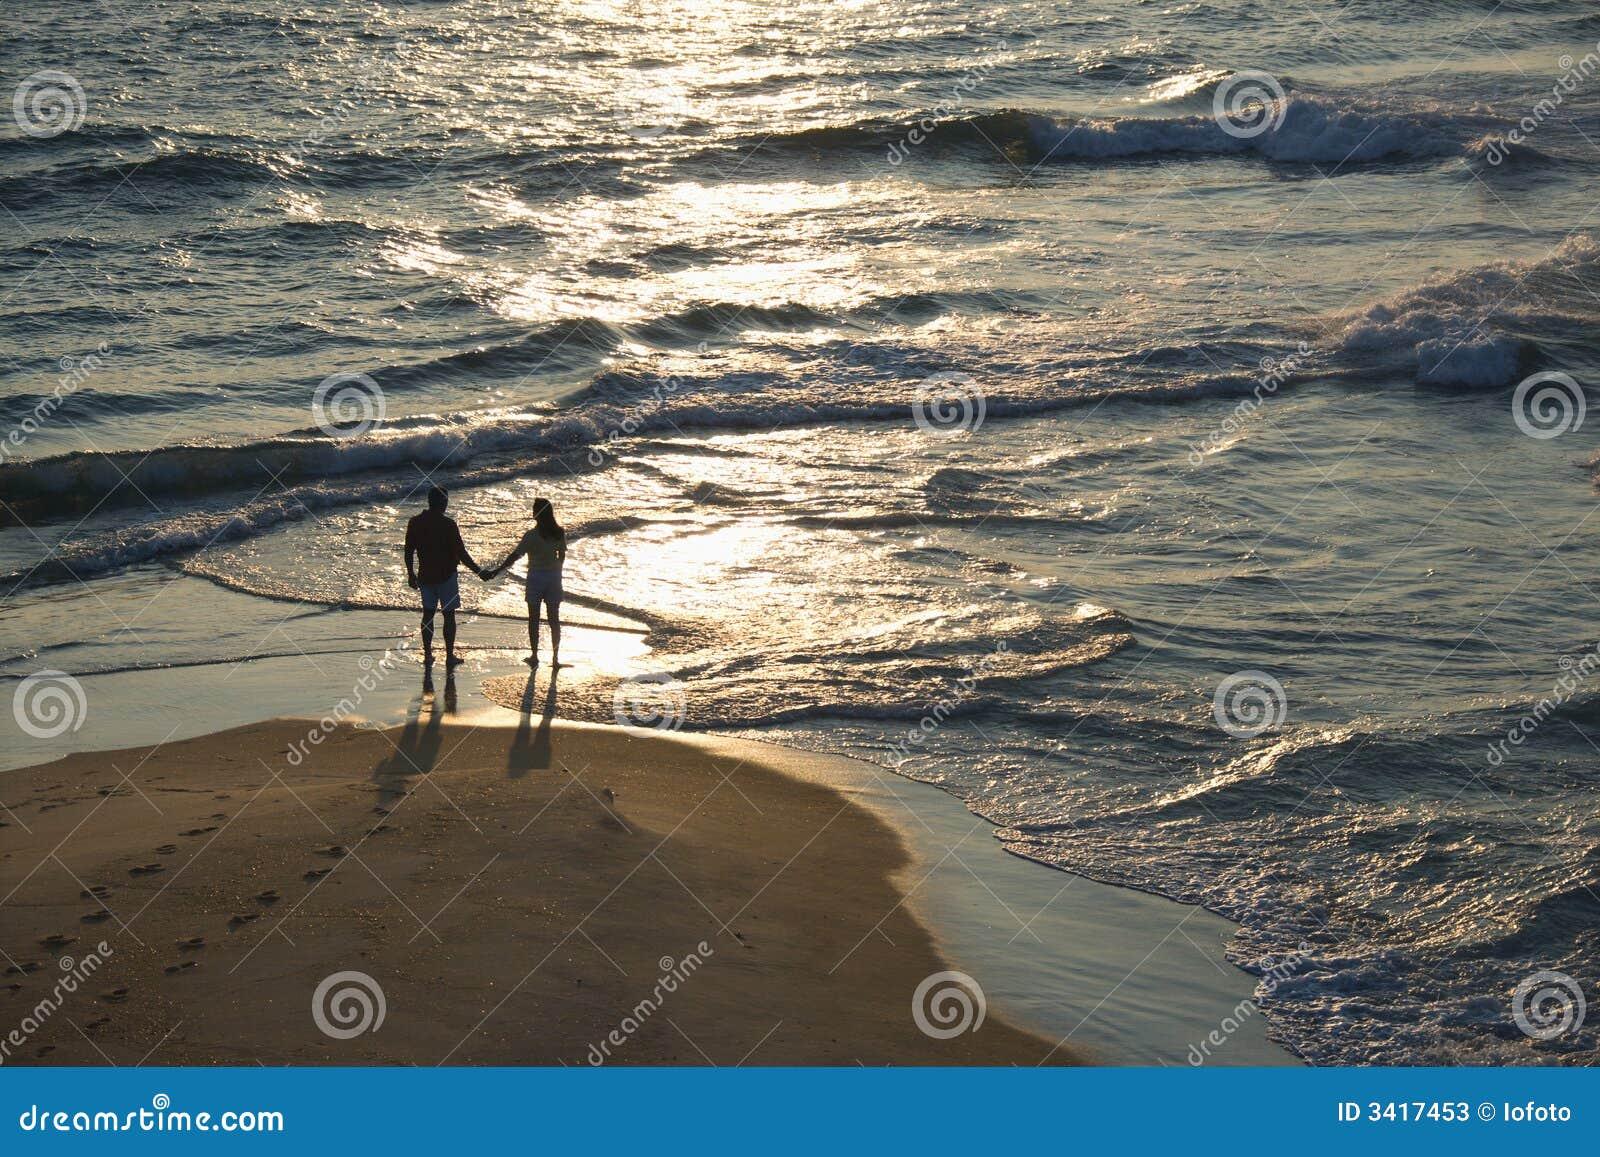 Aerial of couple on beach.